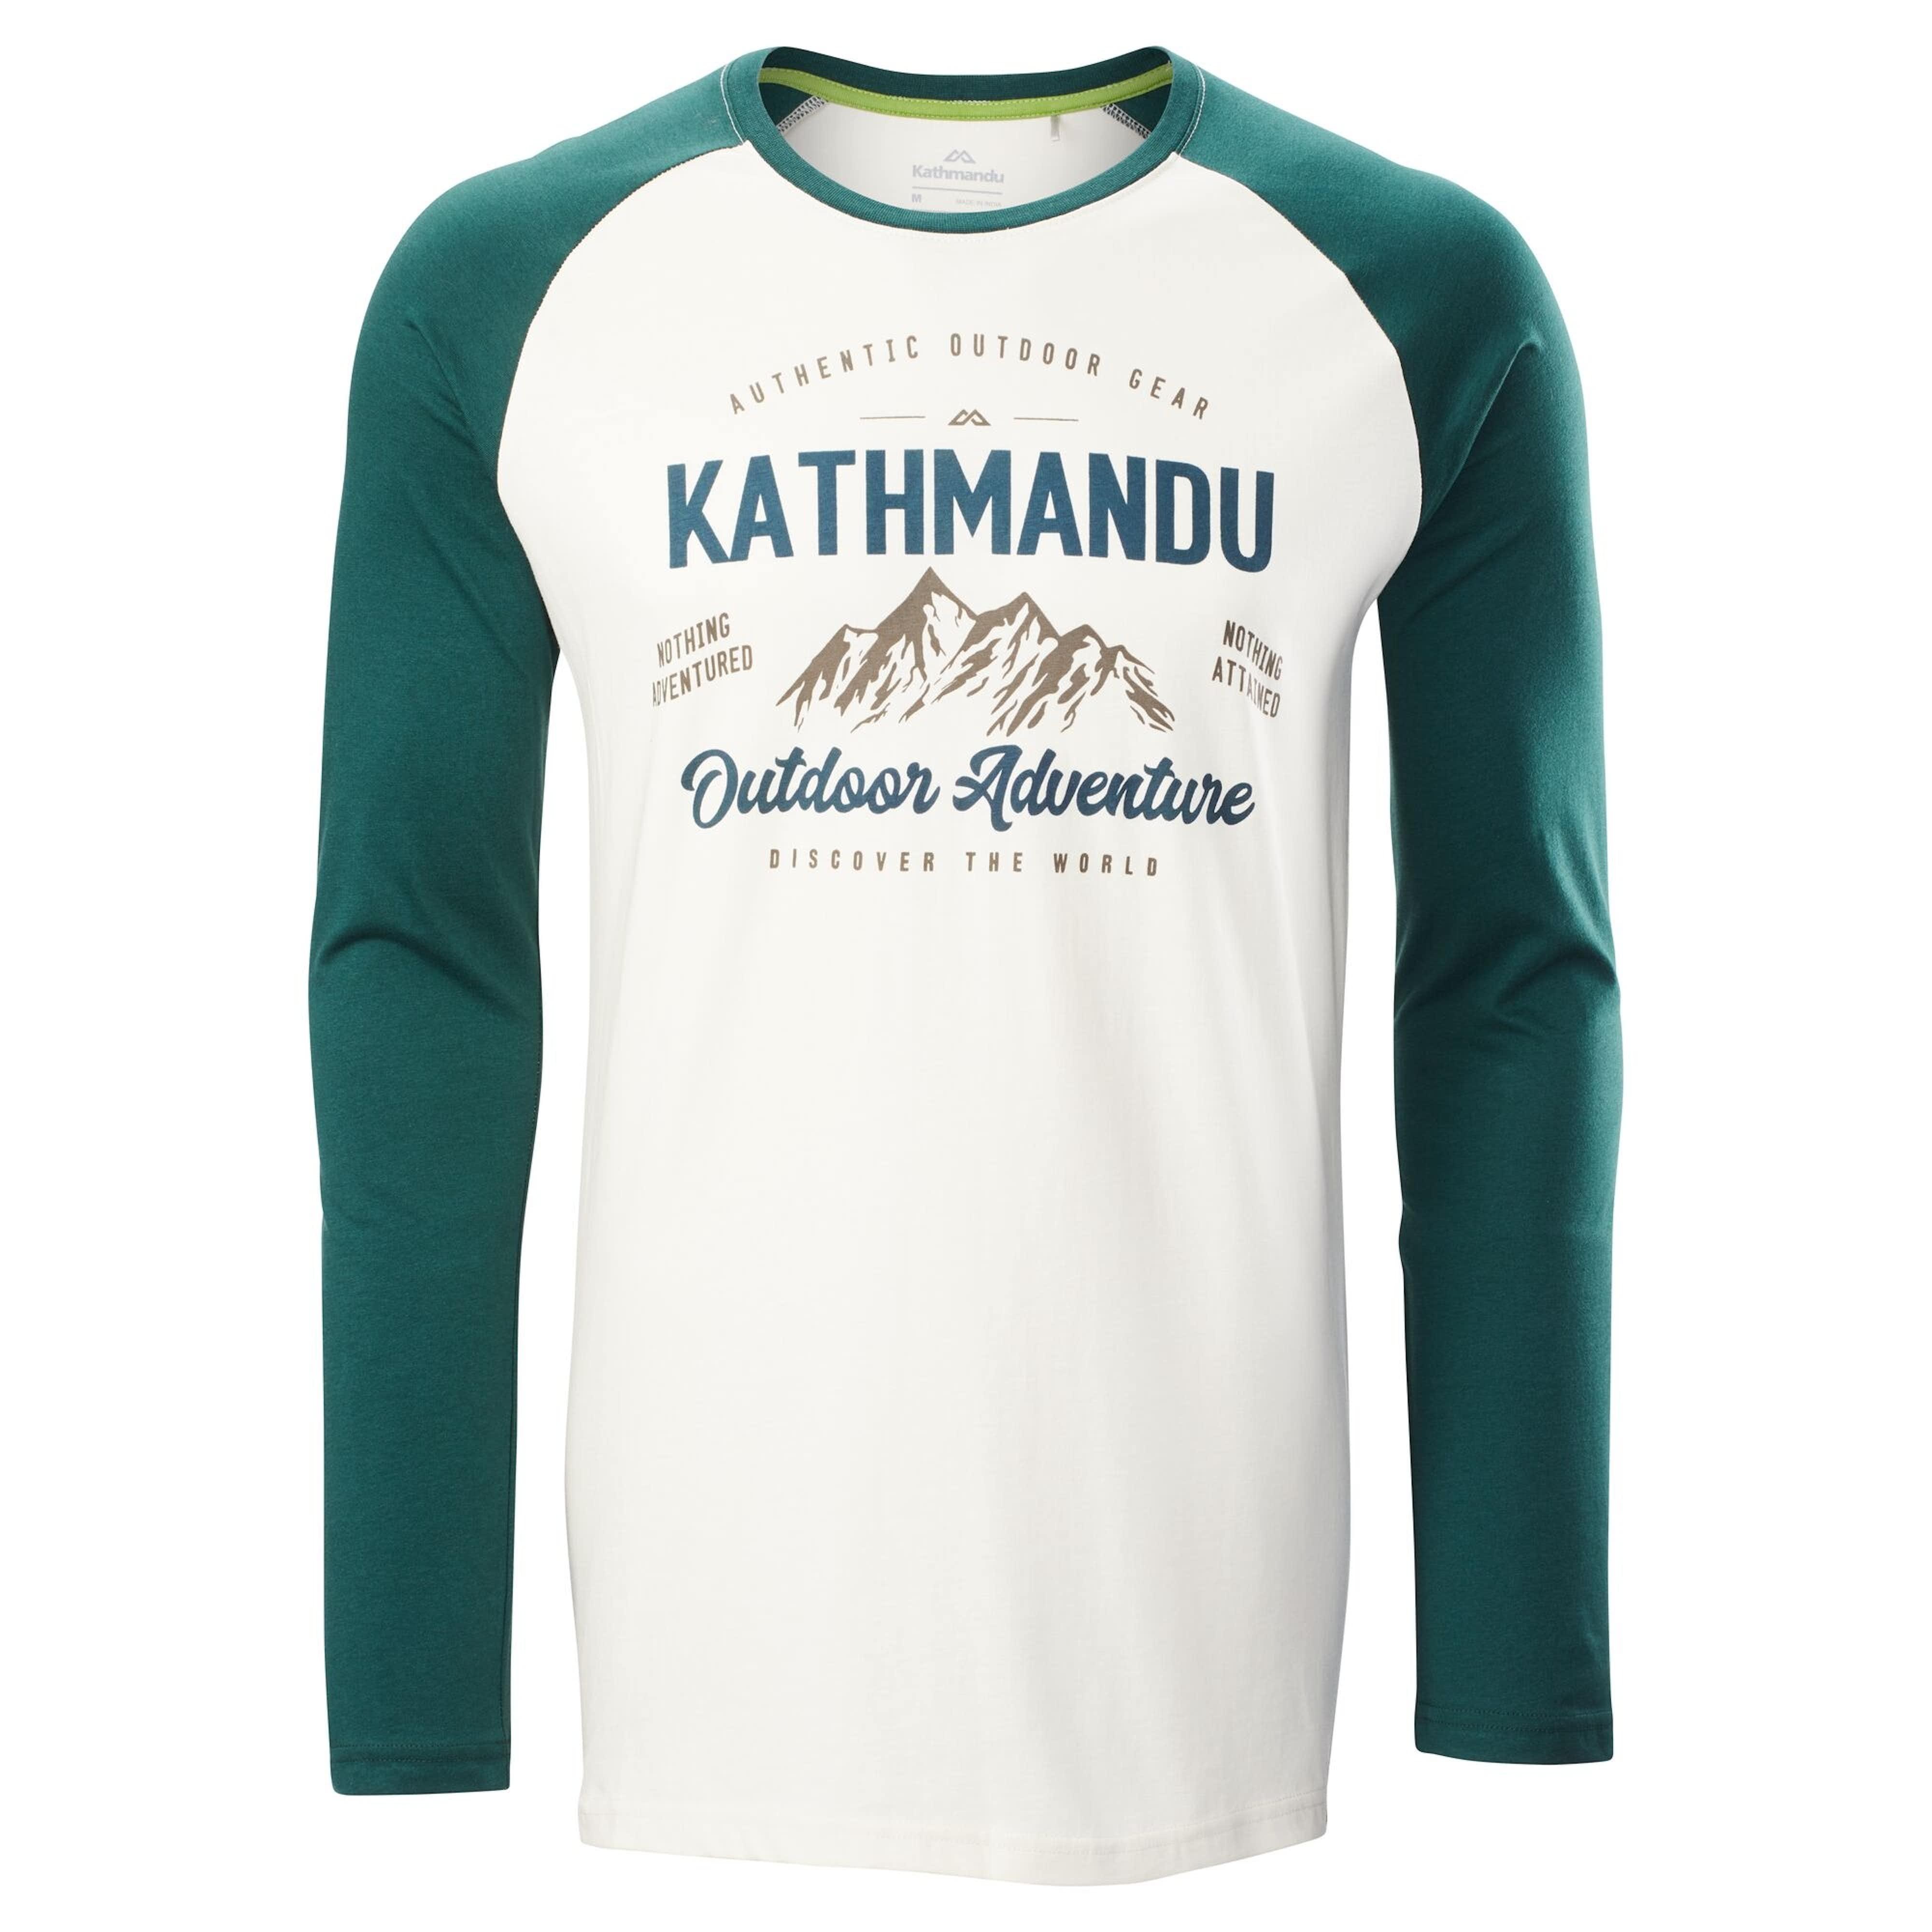 8e1e18a72 Men's Shirts & T-Shirts Sale Online   Tops for Men   Kathmandu NZ